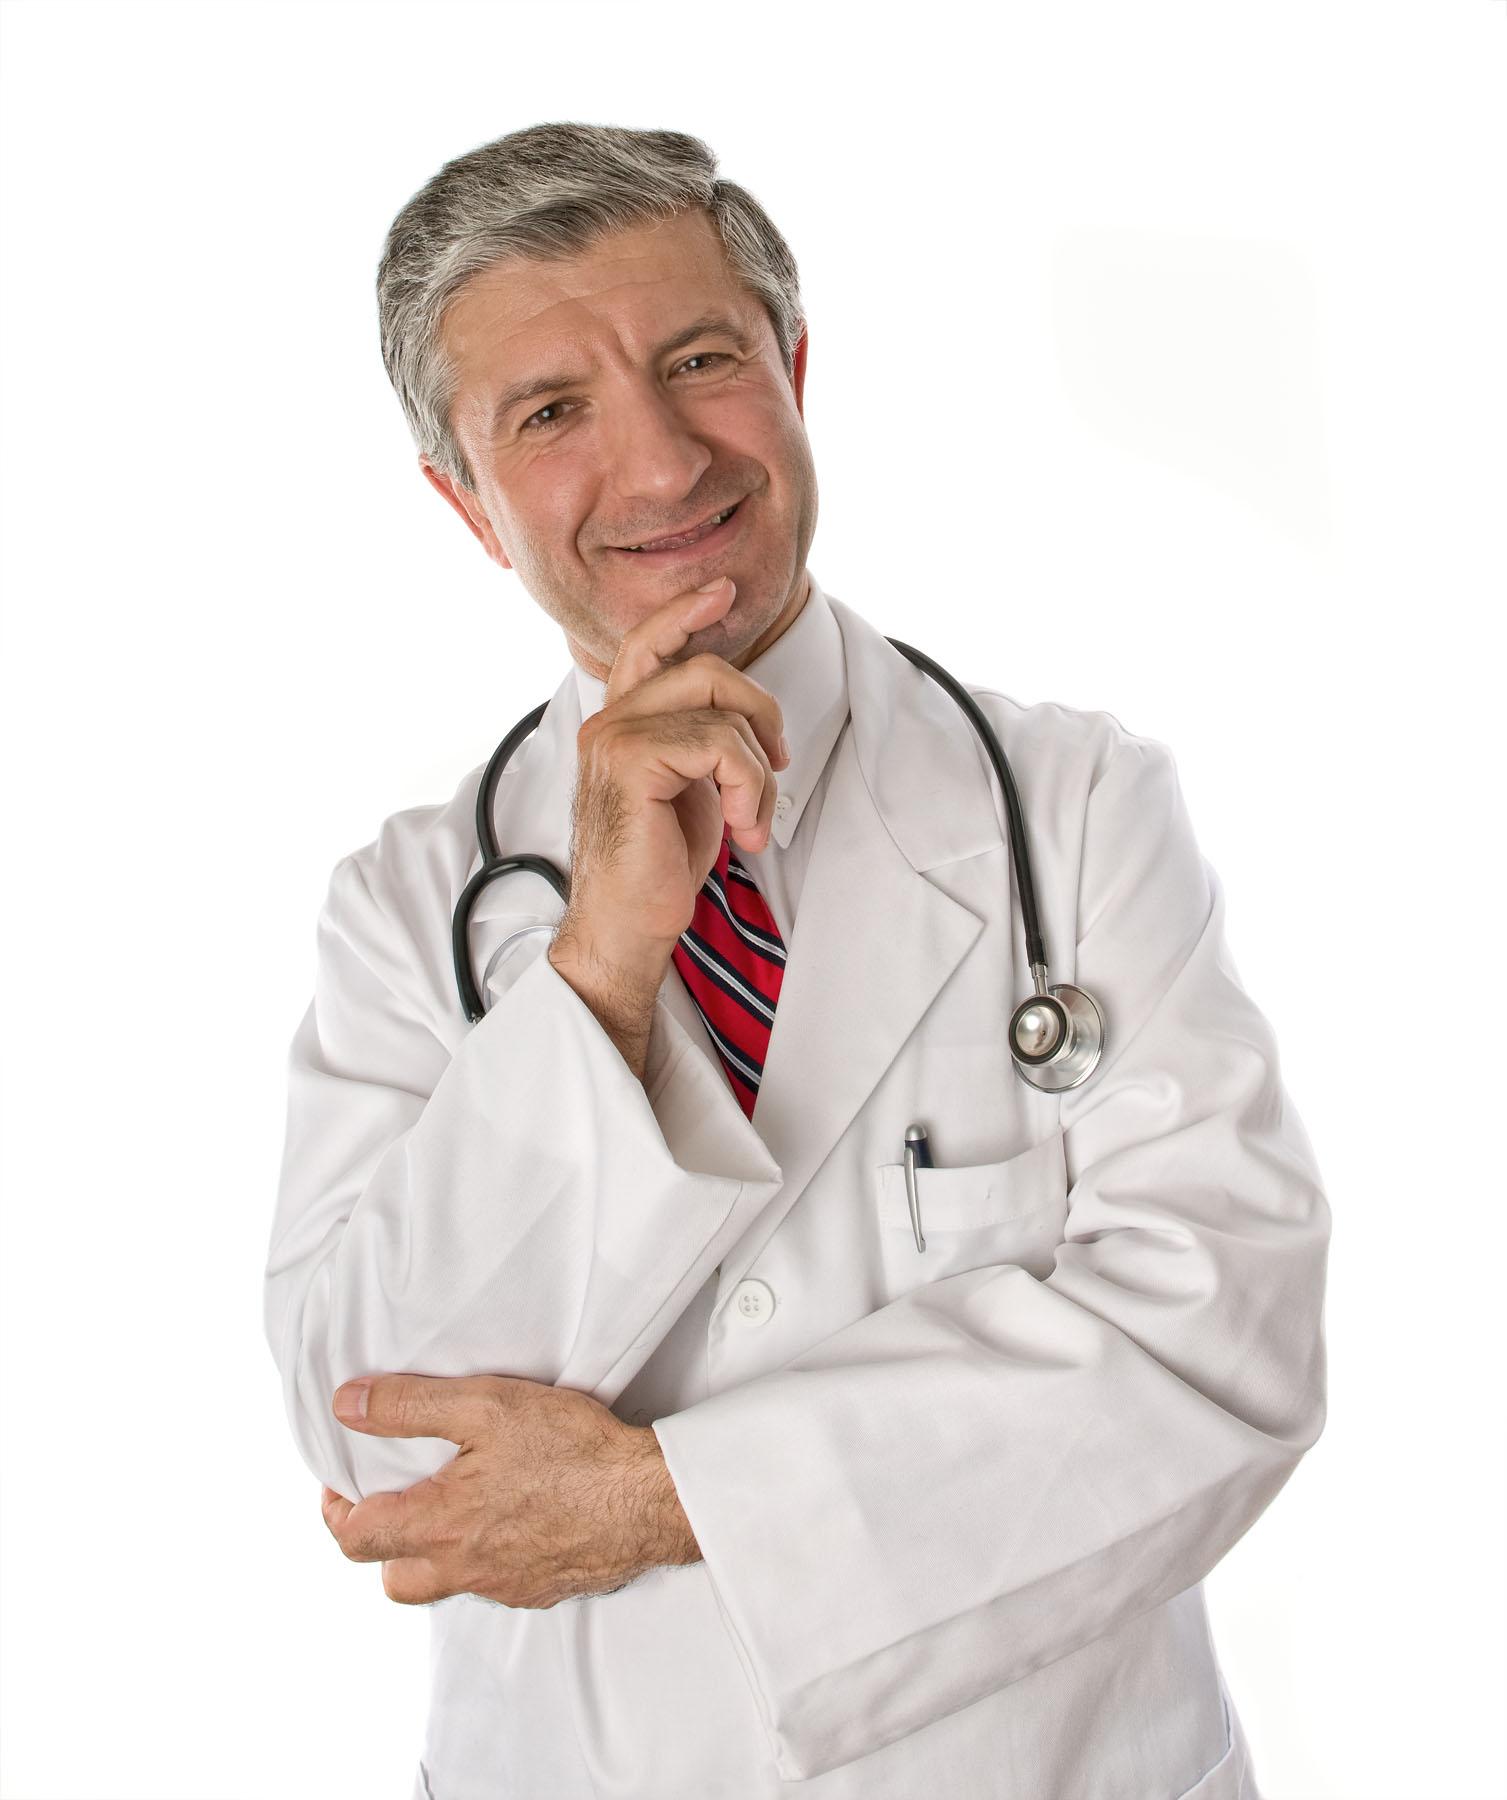 Doctor of Medicine